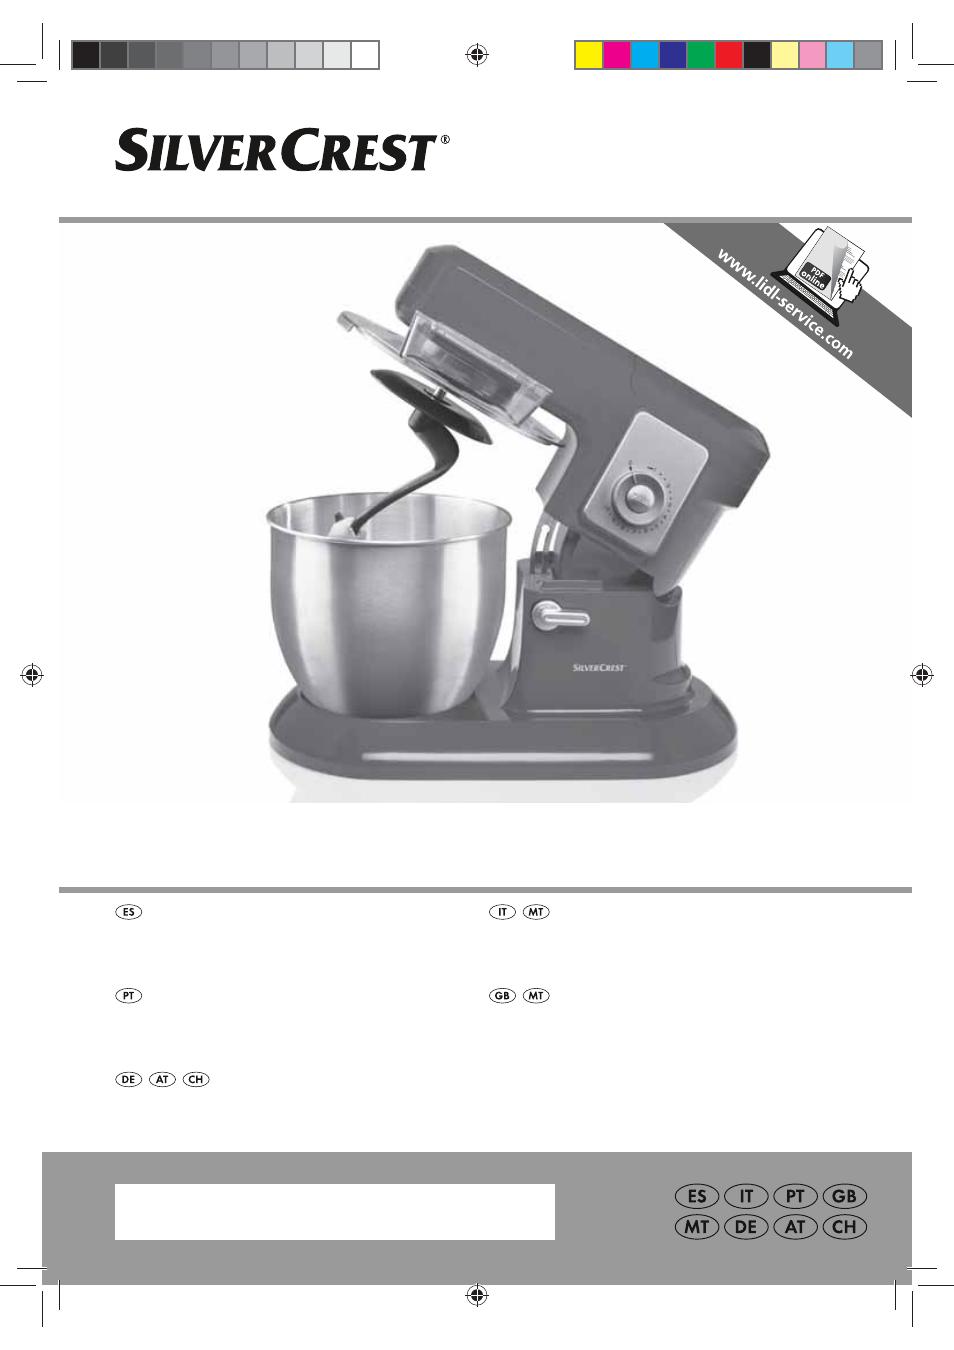 Silvercrest SKMP 1200 A2 User Manual   94 pages